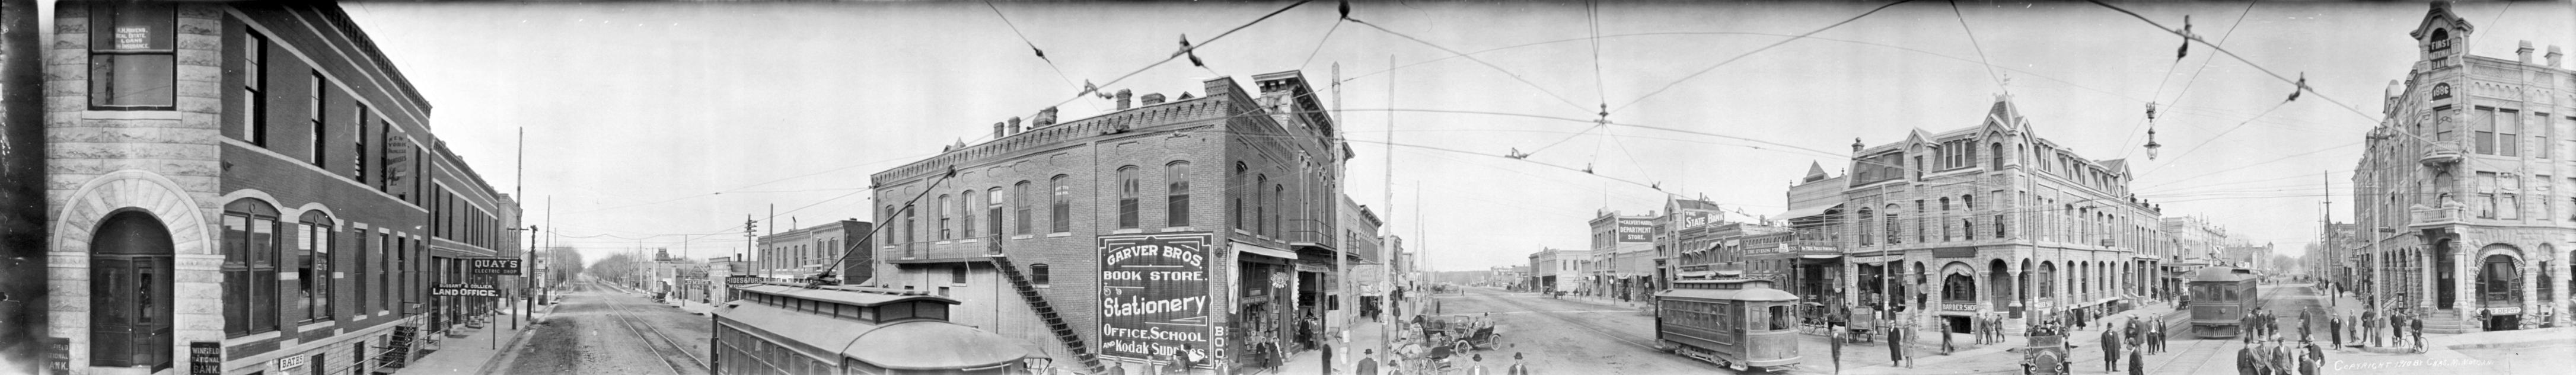 Winfield panorama (1910)